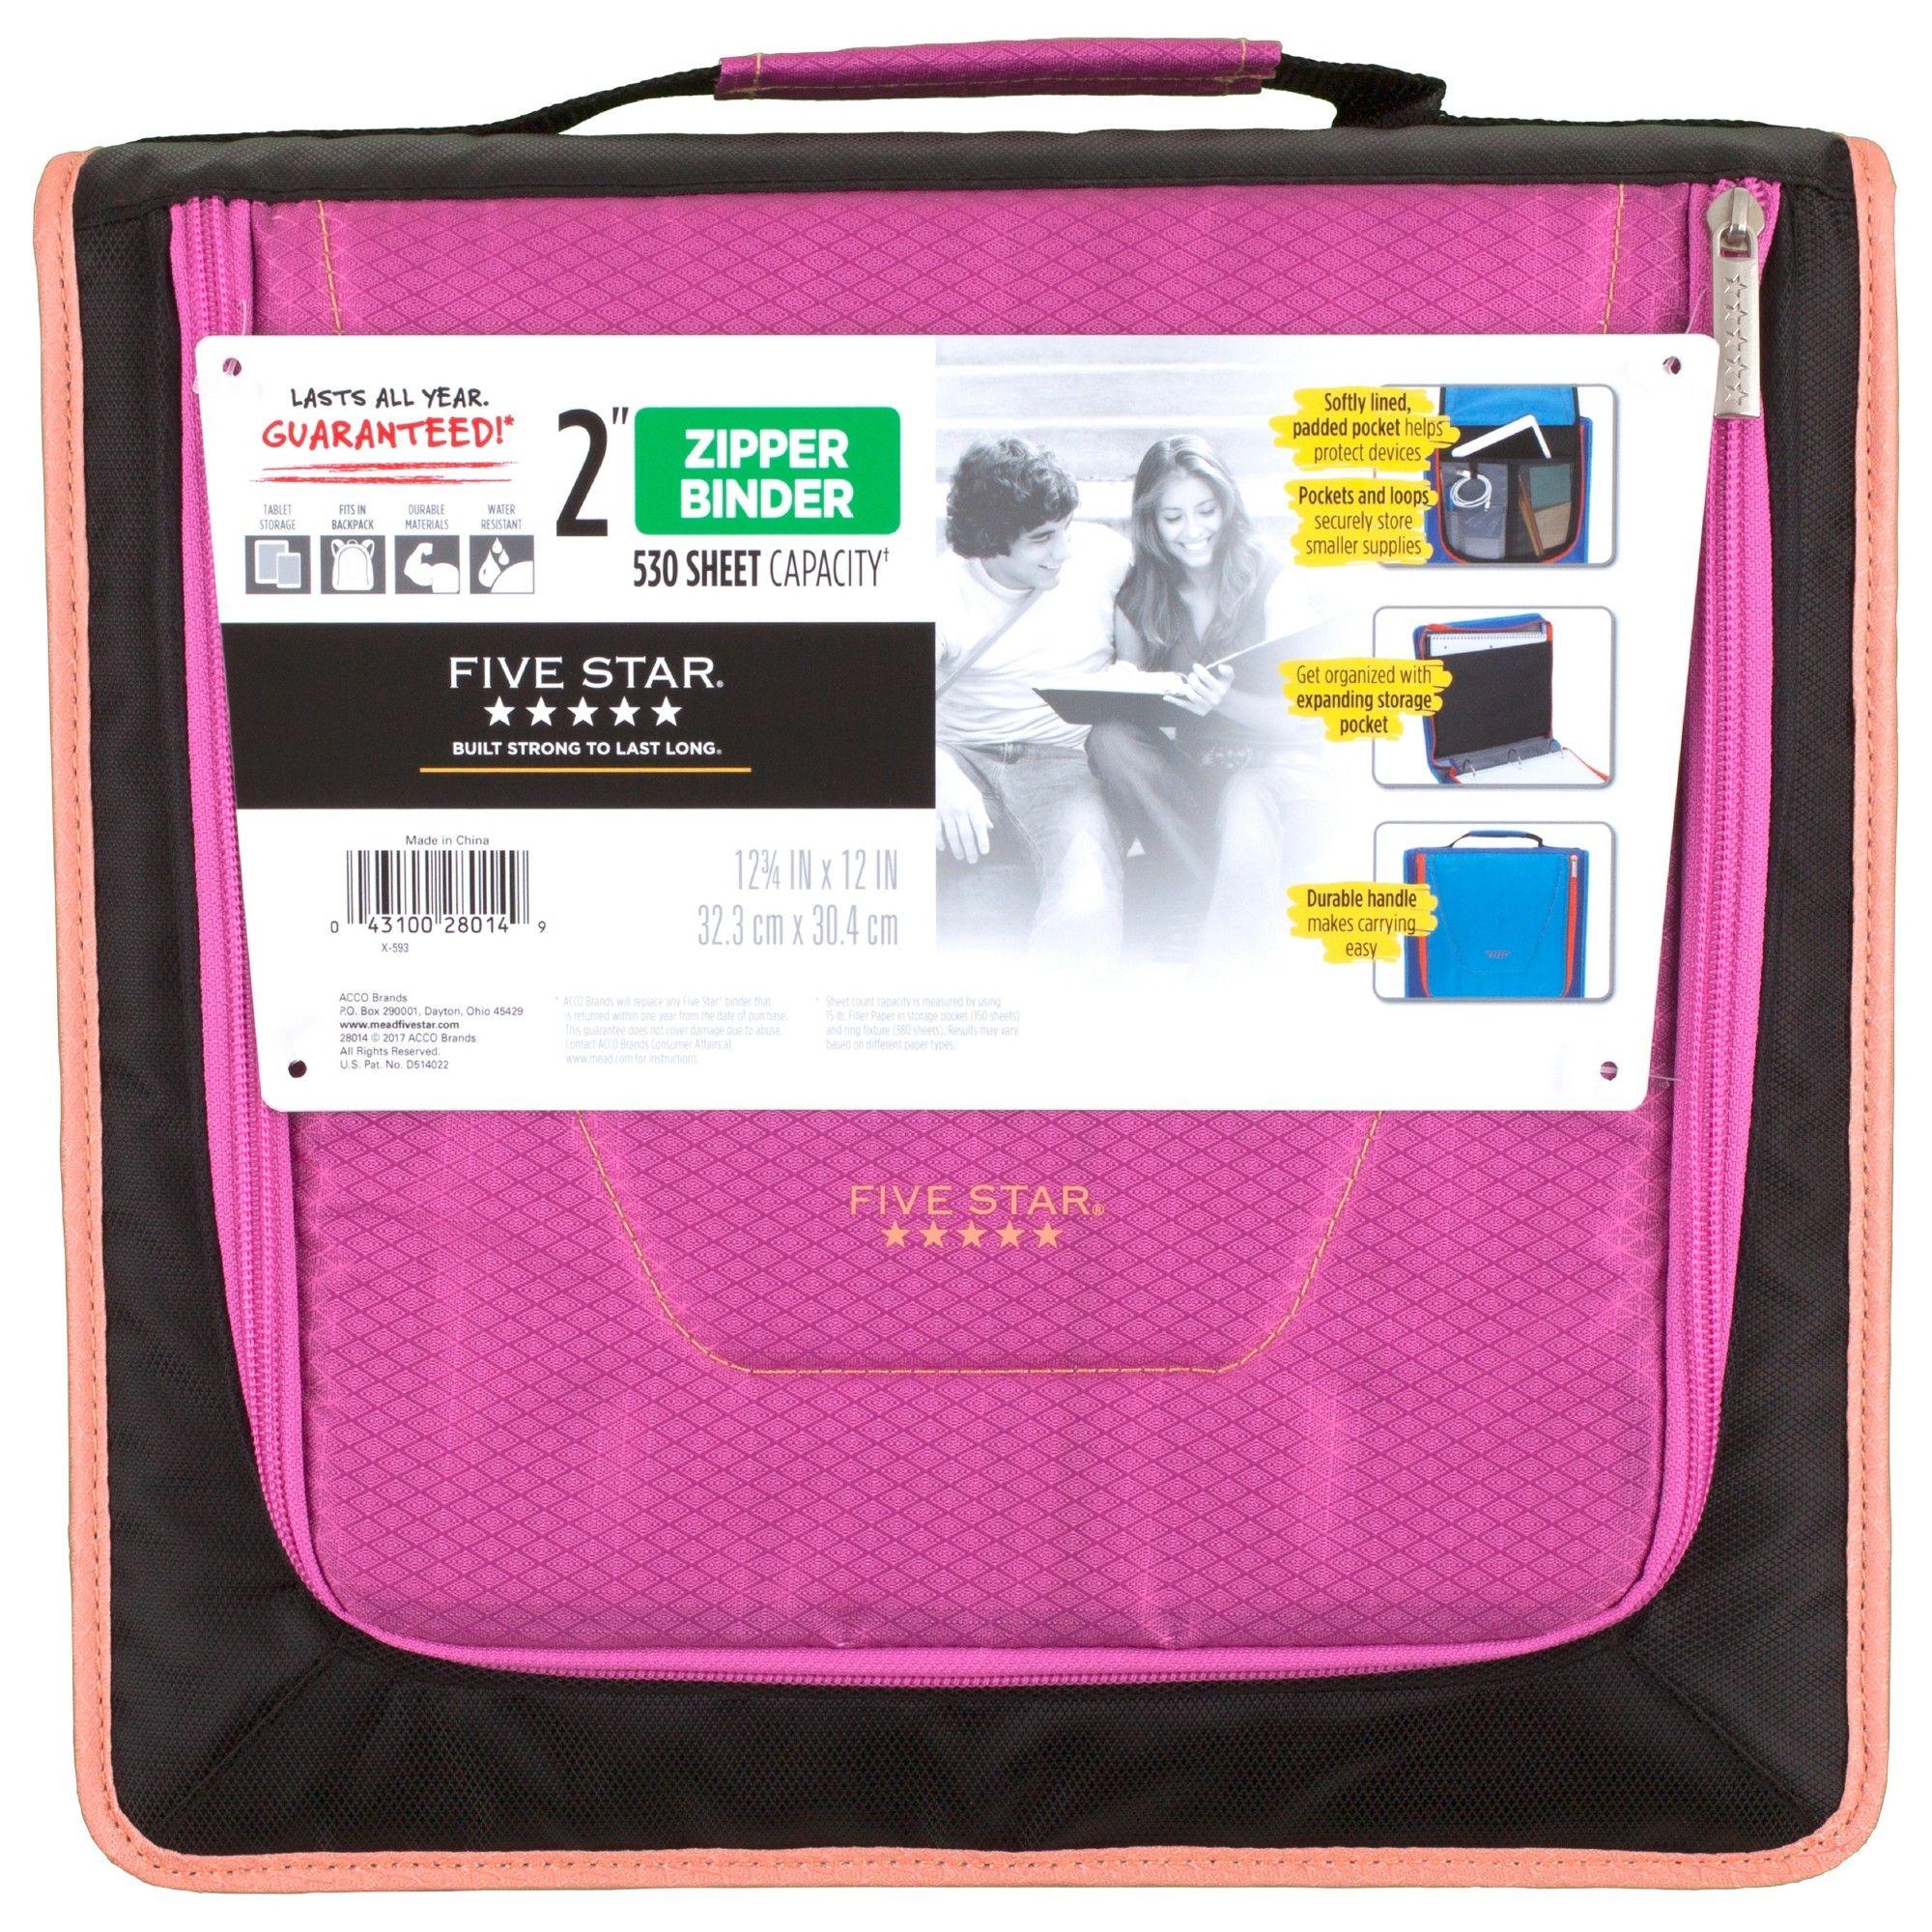 "Five Star 2"" Zipper Binder With Handle Pink"